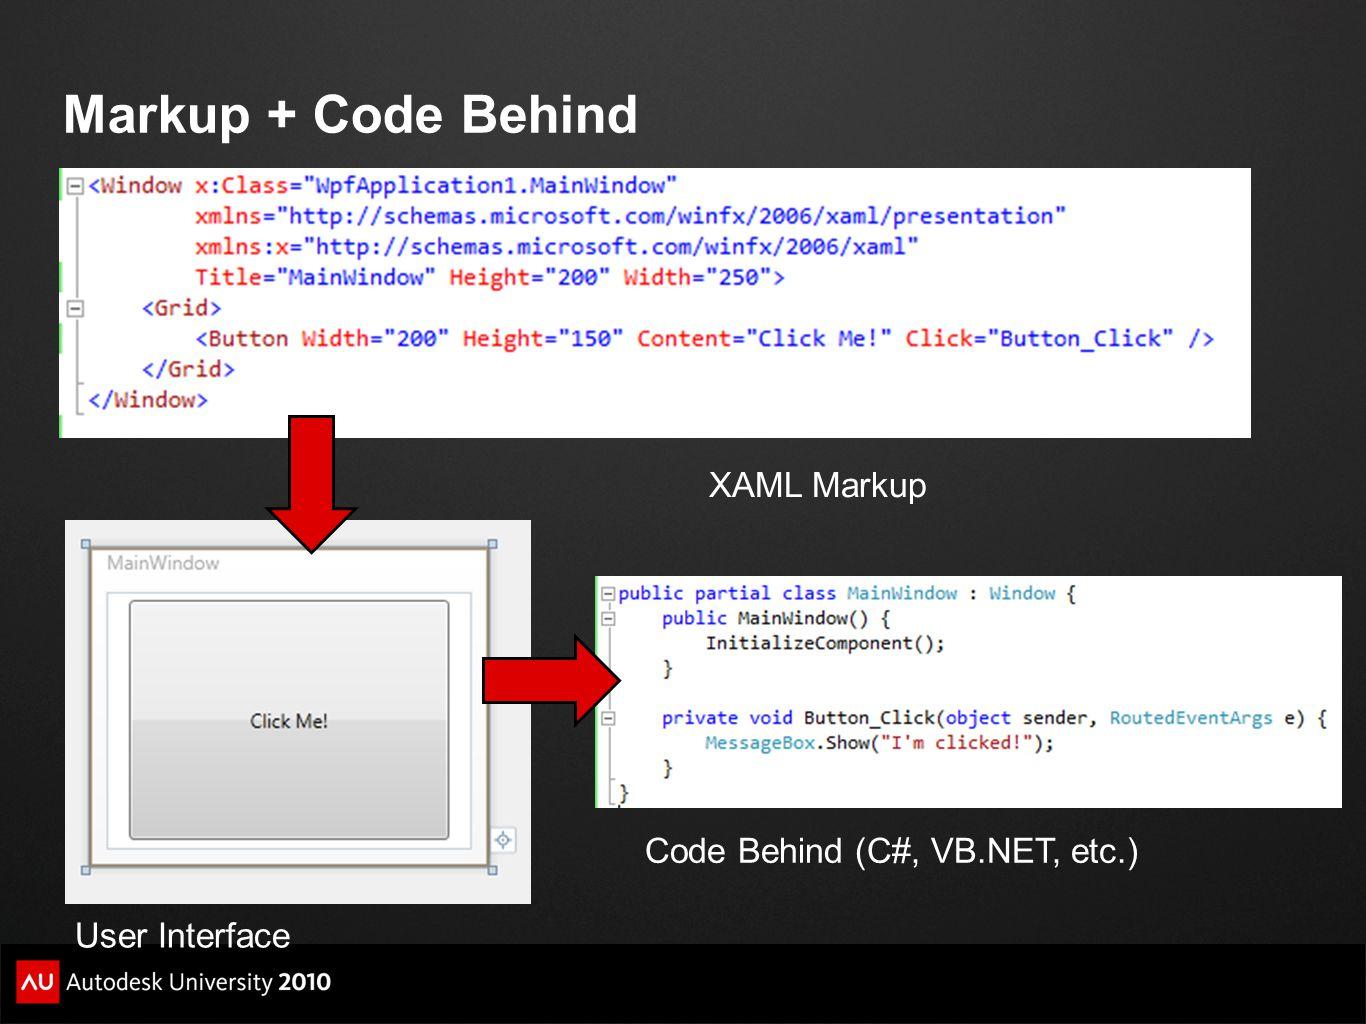 Markup + Code Behind XAML Markup User Interface Code Behind (C#, VB.NET, etc.)